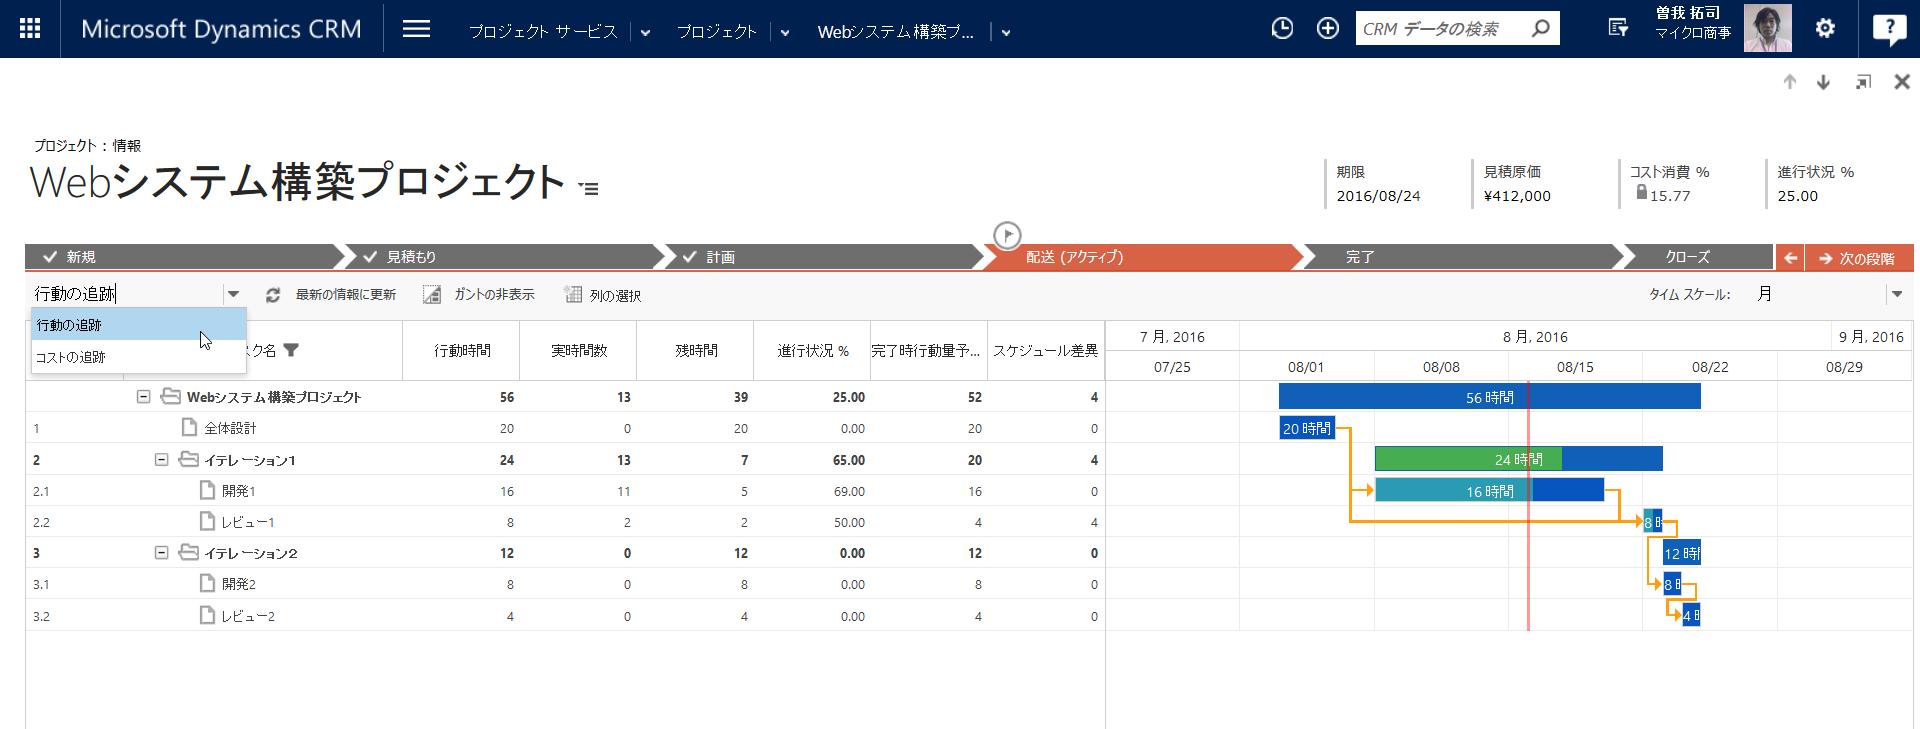 Webシステム構築プロジェクト ガントチャート